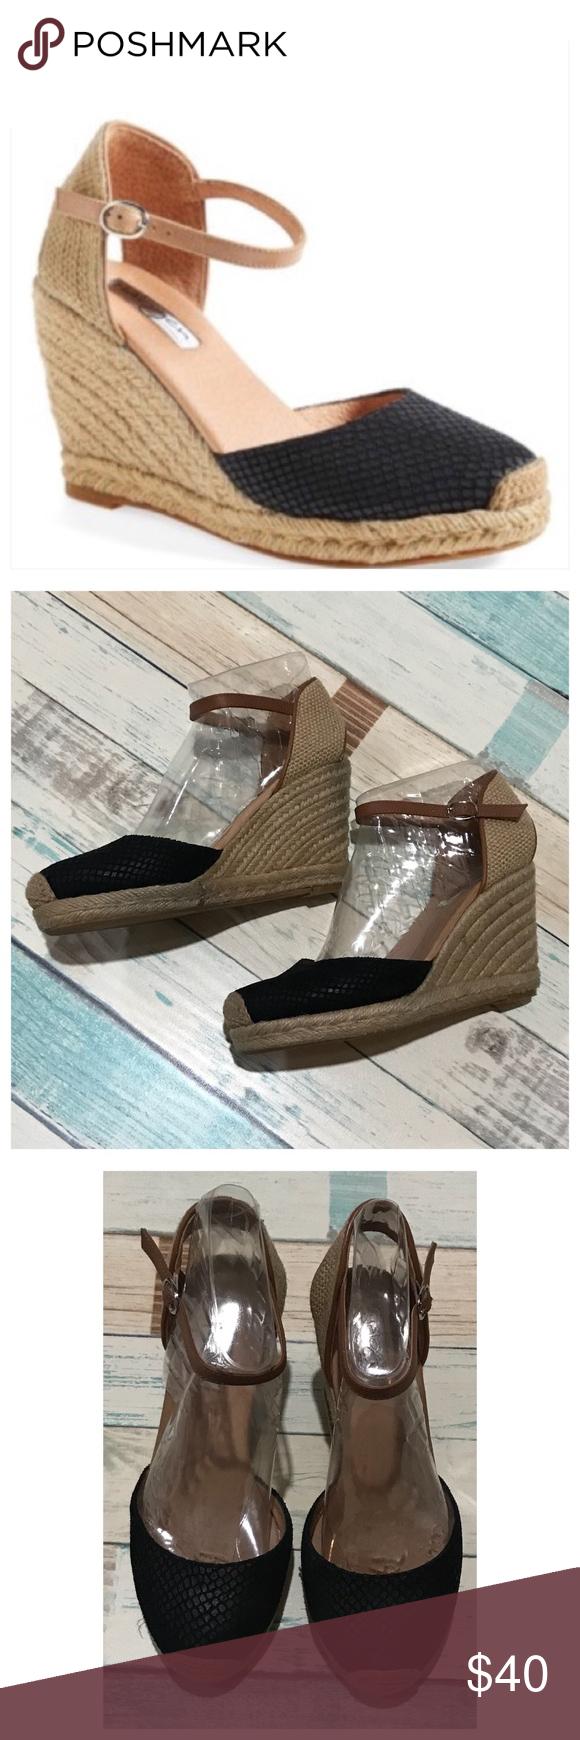 "c552b1d63c71 Halogen Sandra wedge black size 5.5 EUC! 3.5"" heel. Leather upper.  Adjustable strap with buckle closure. Halogen Shoes Espadrilles"